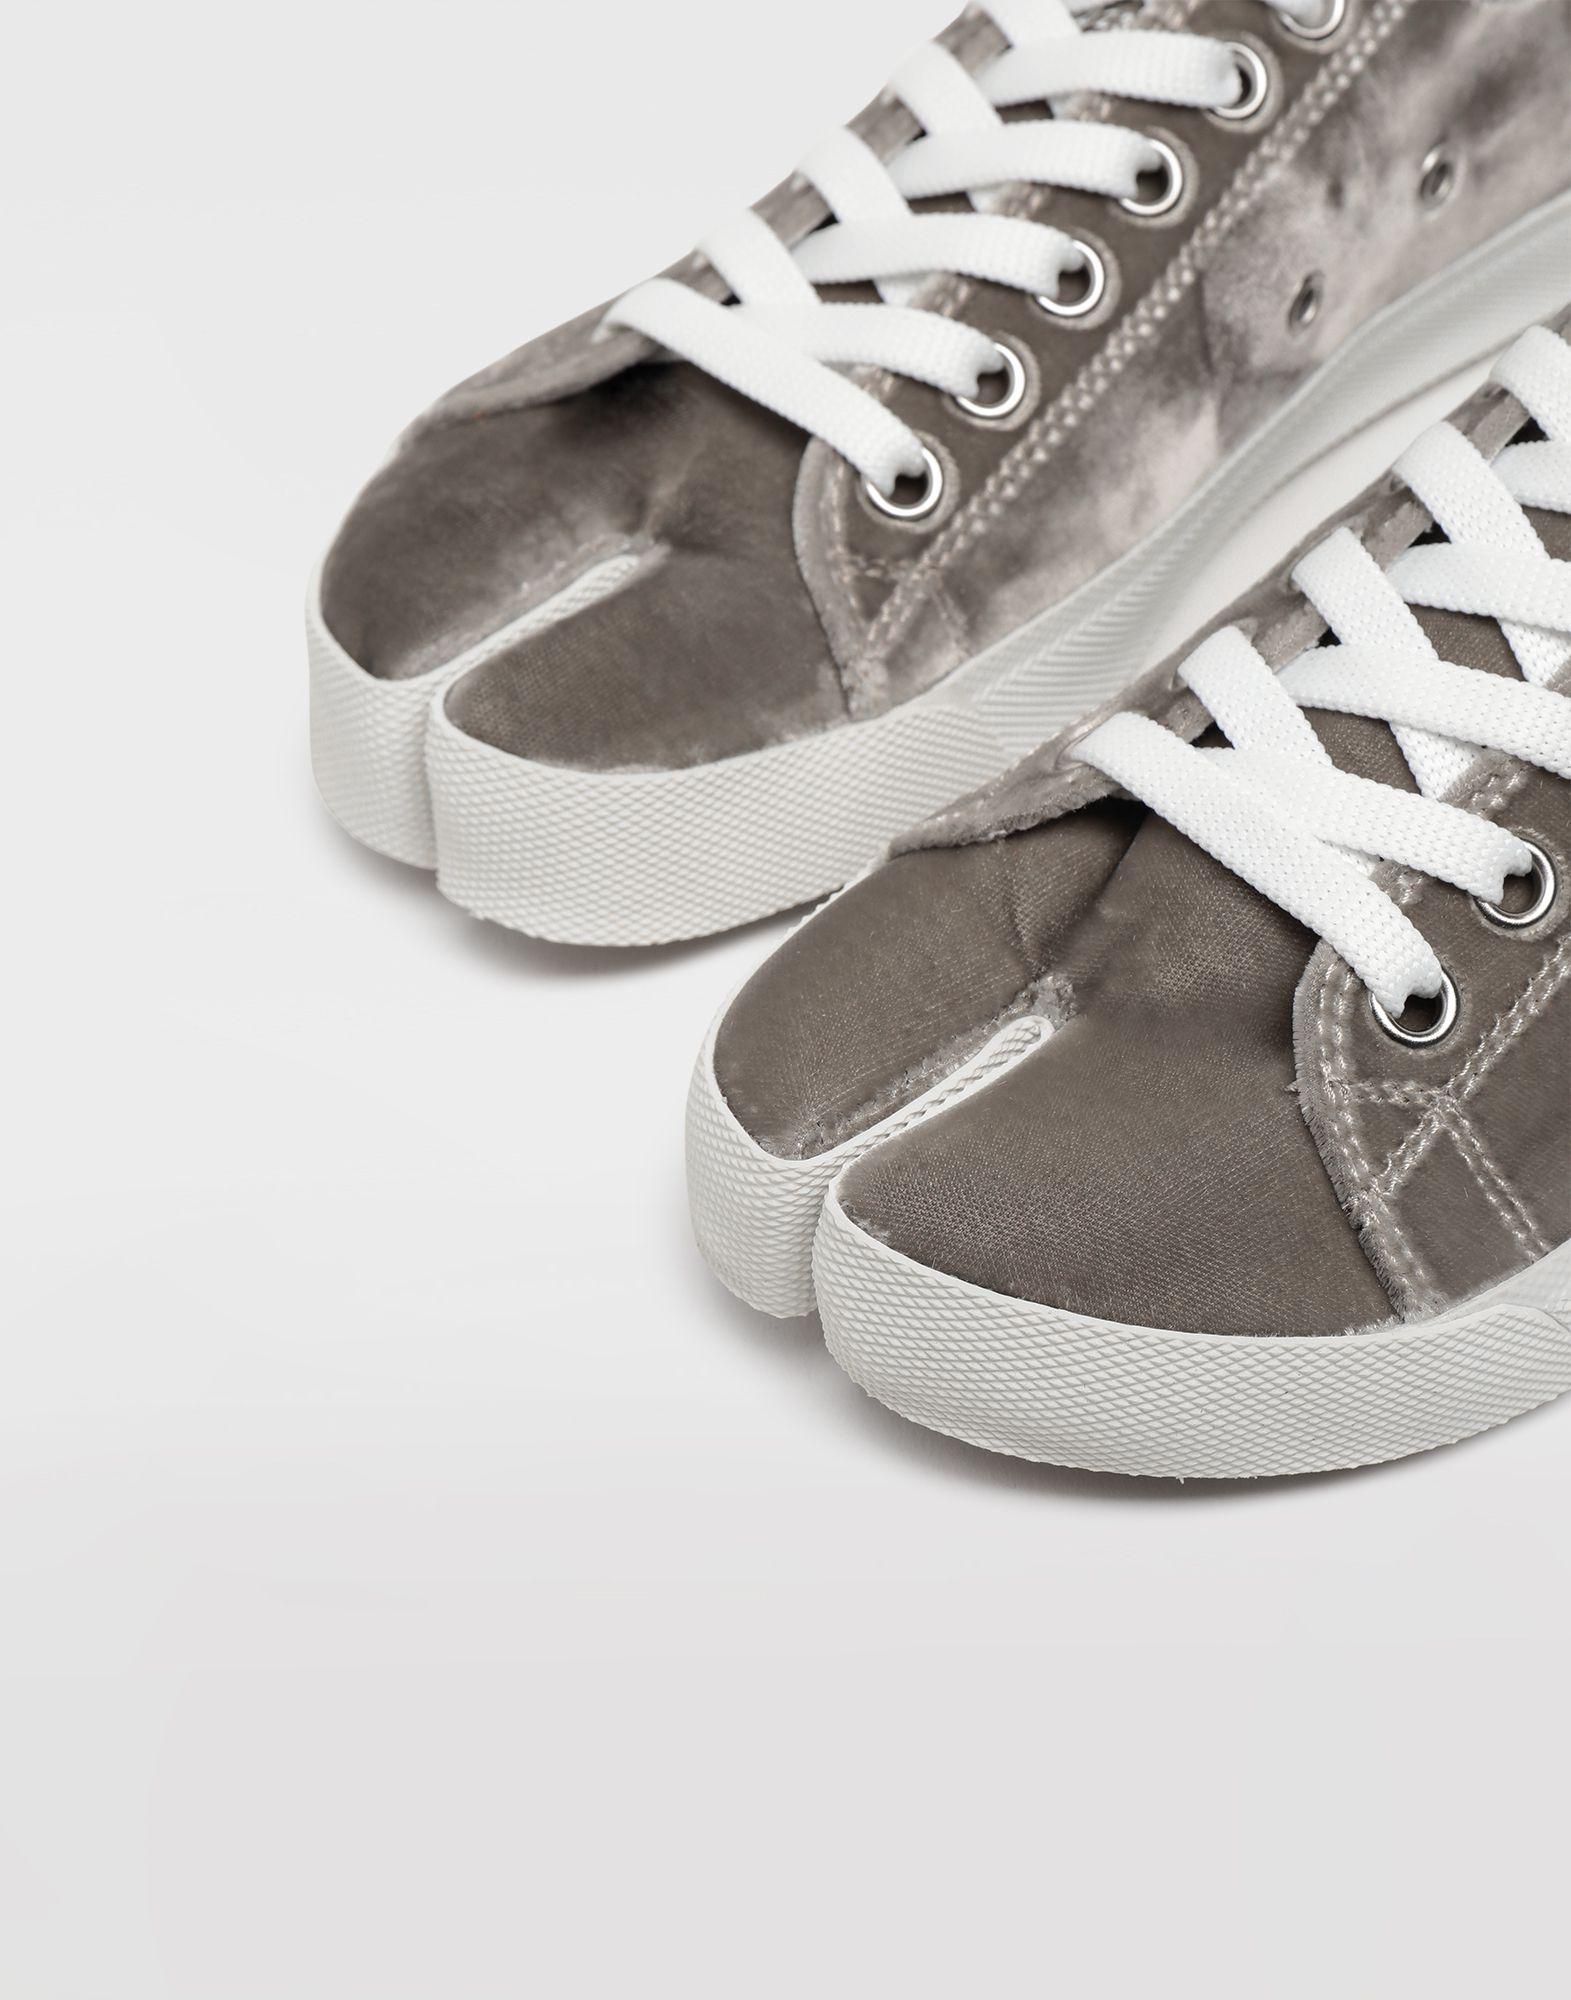 MAISON MARGIELA Sneakers Tabi aus Samt Sneakers Tabi Dame b